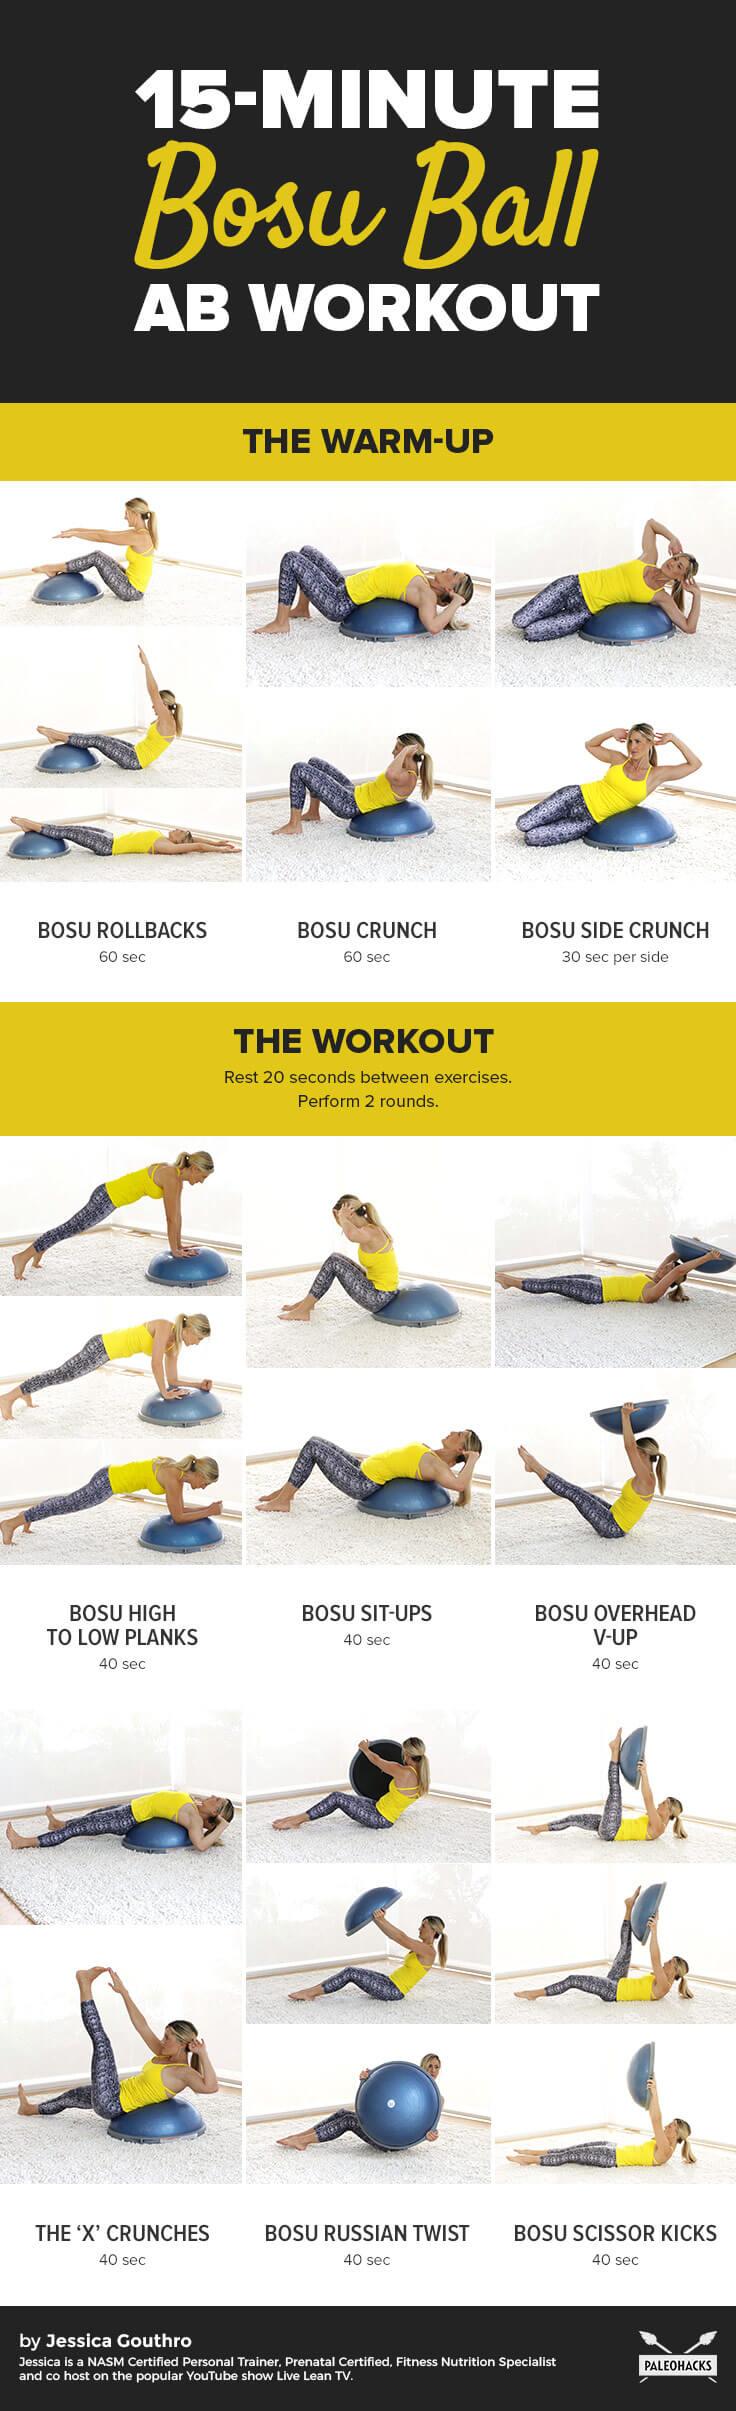 15-Minute Bosu Ball Ab Workout + Warm-up Routine